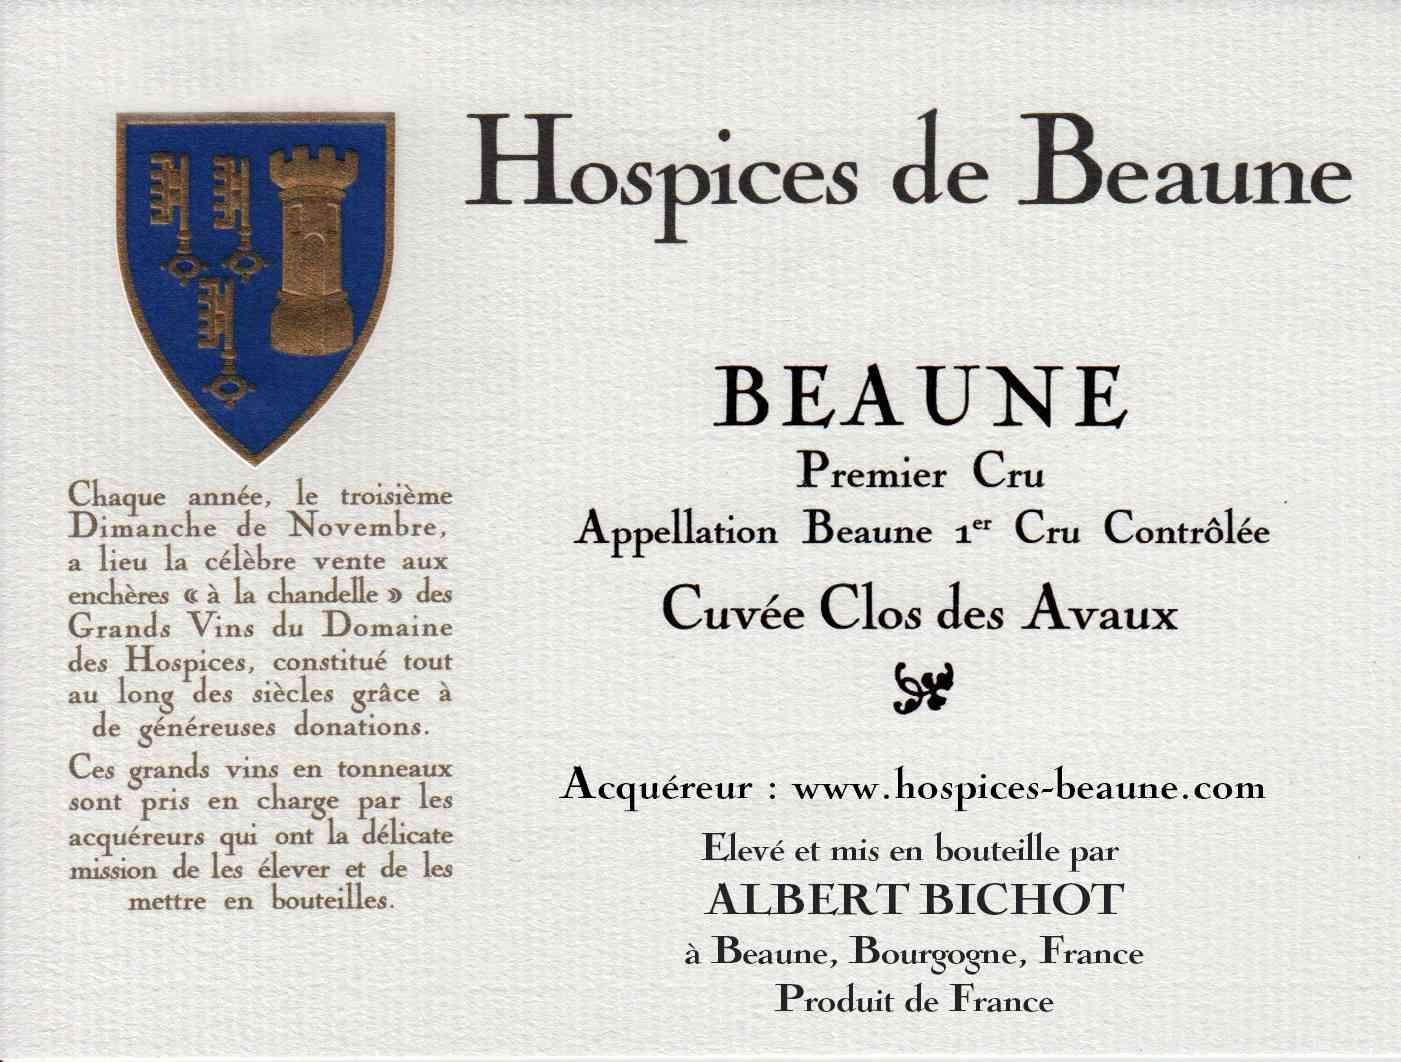 Encheres-auction-HospicesdeBeaune-AlbertBichot-Beaune1erCru-Cuvee-ClosdesAvaux